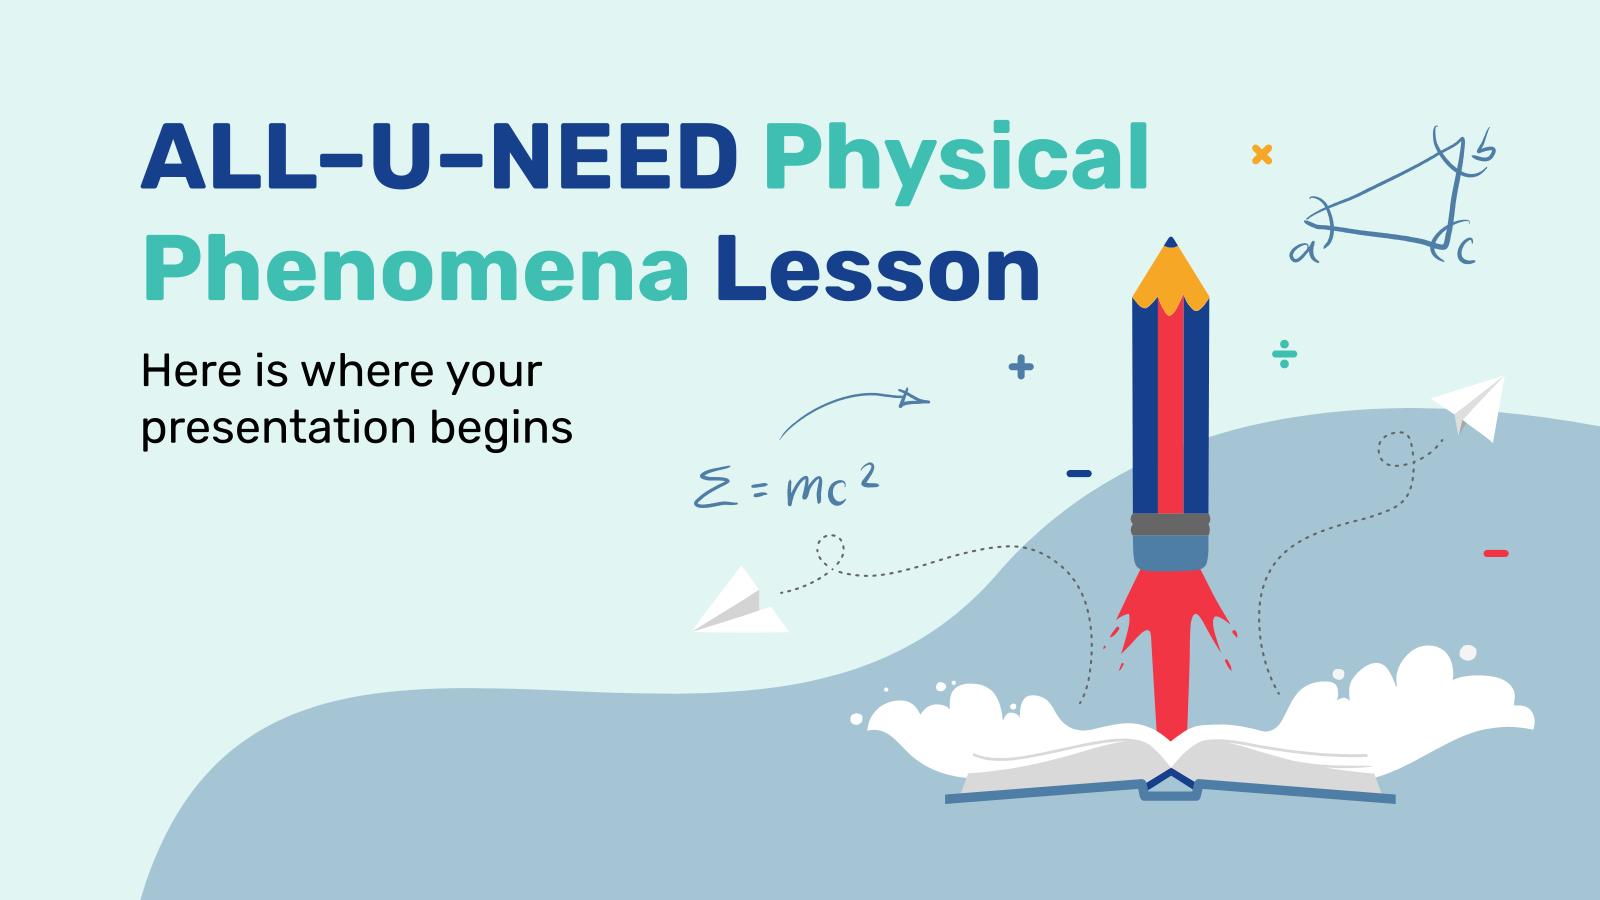 All-U-Need Physical Phenomena Lesson presentation template